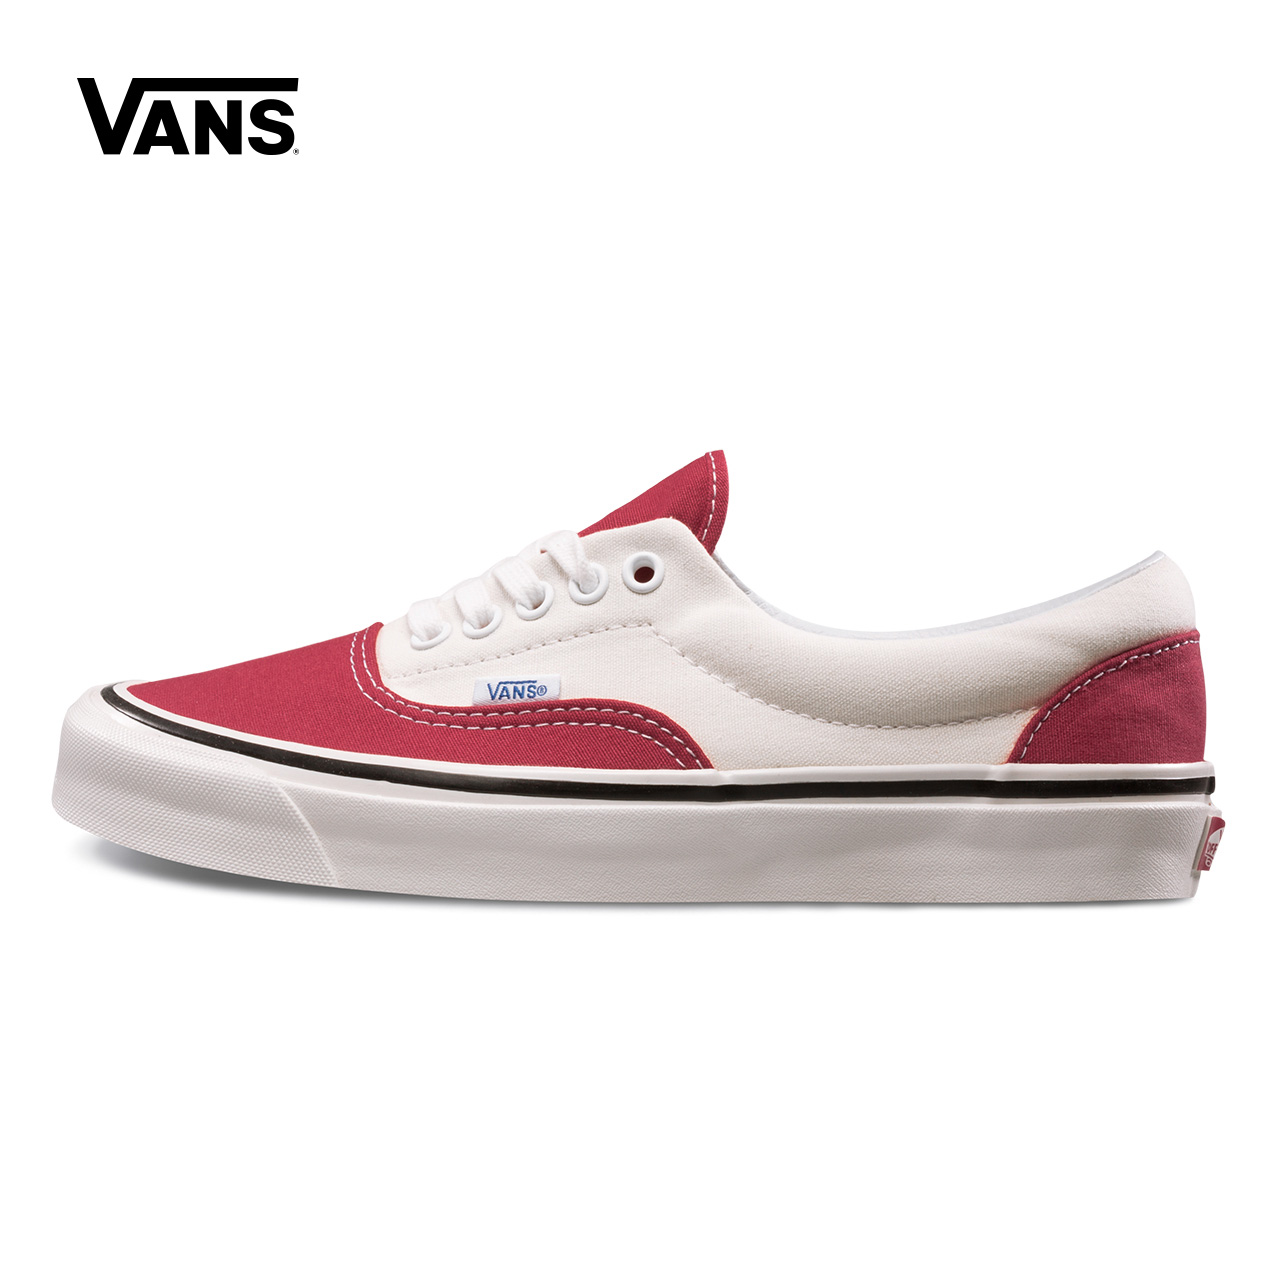 Vans 范斯官方男女款ERA板鞋|VN0A2RR1U8Q